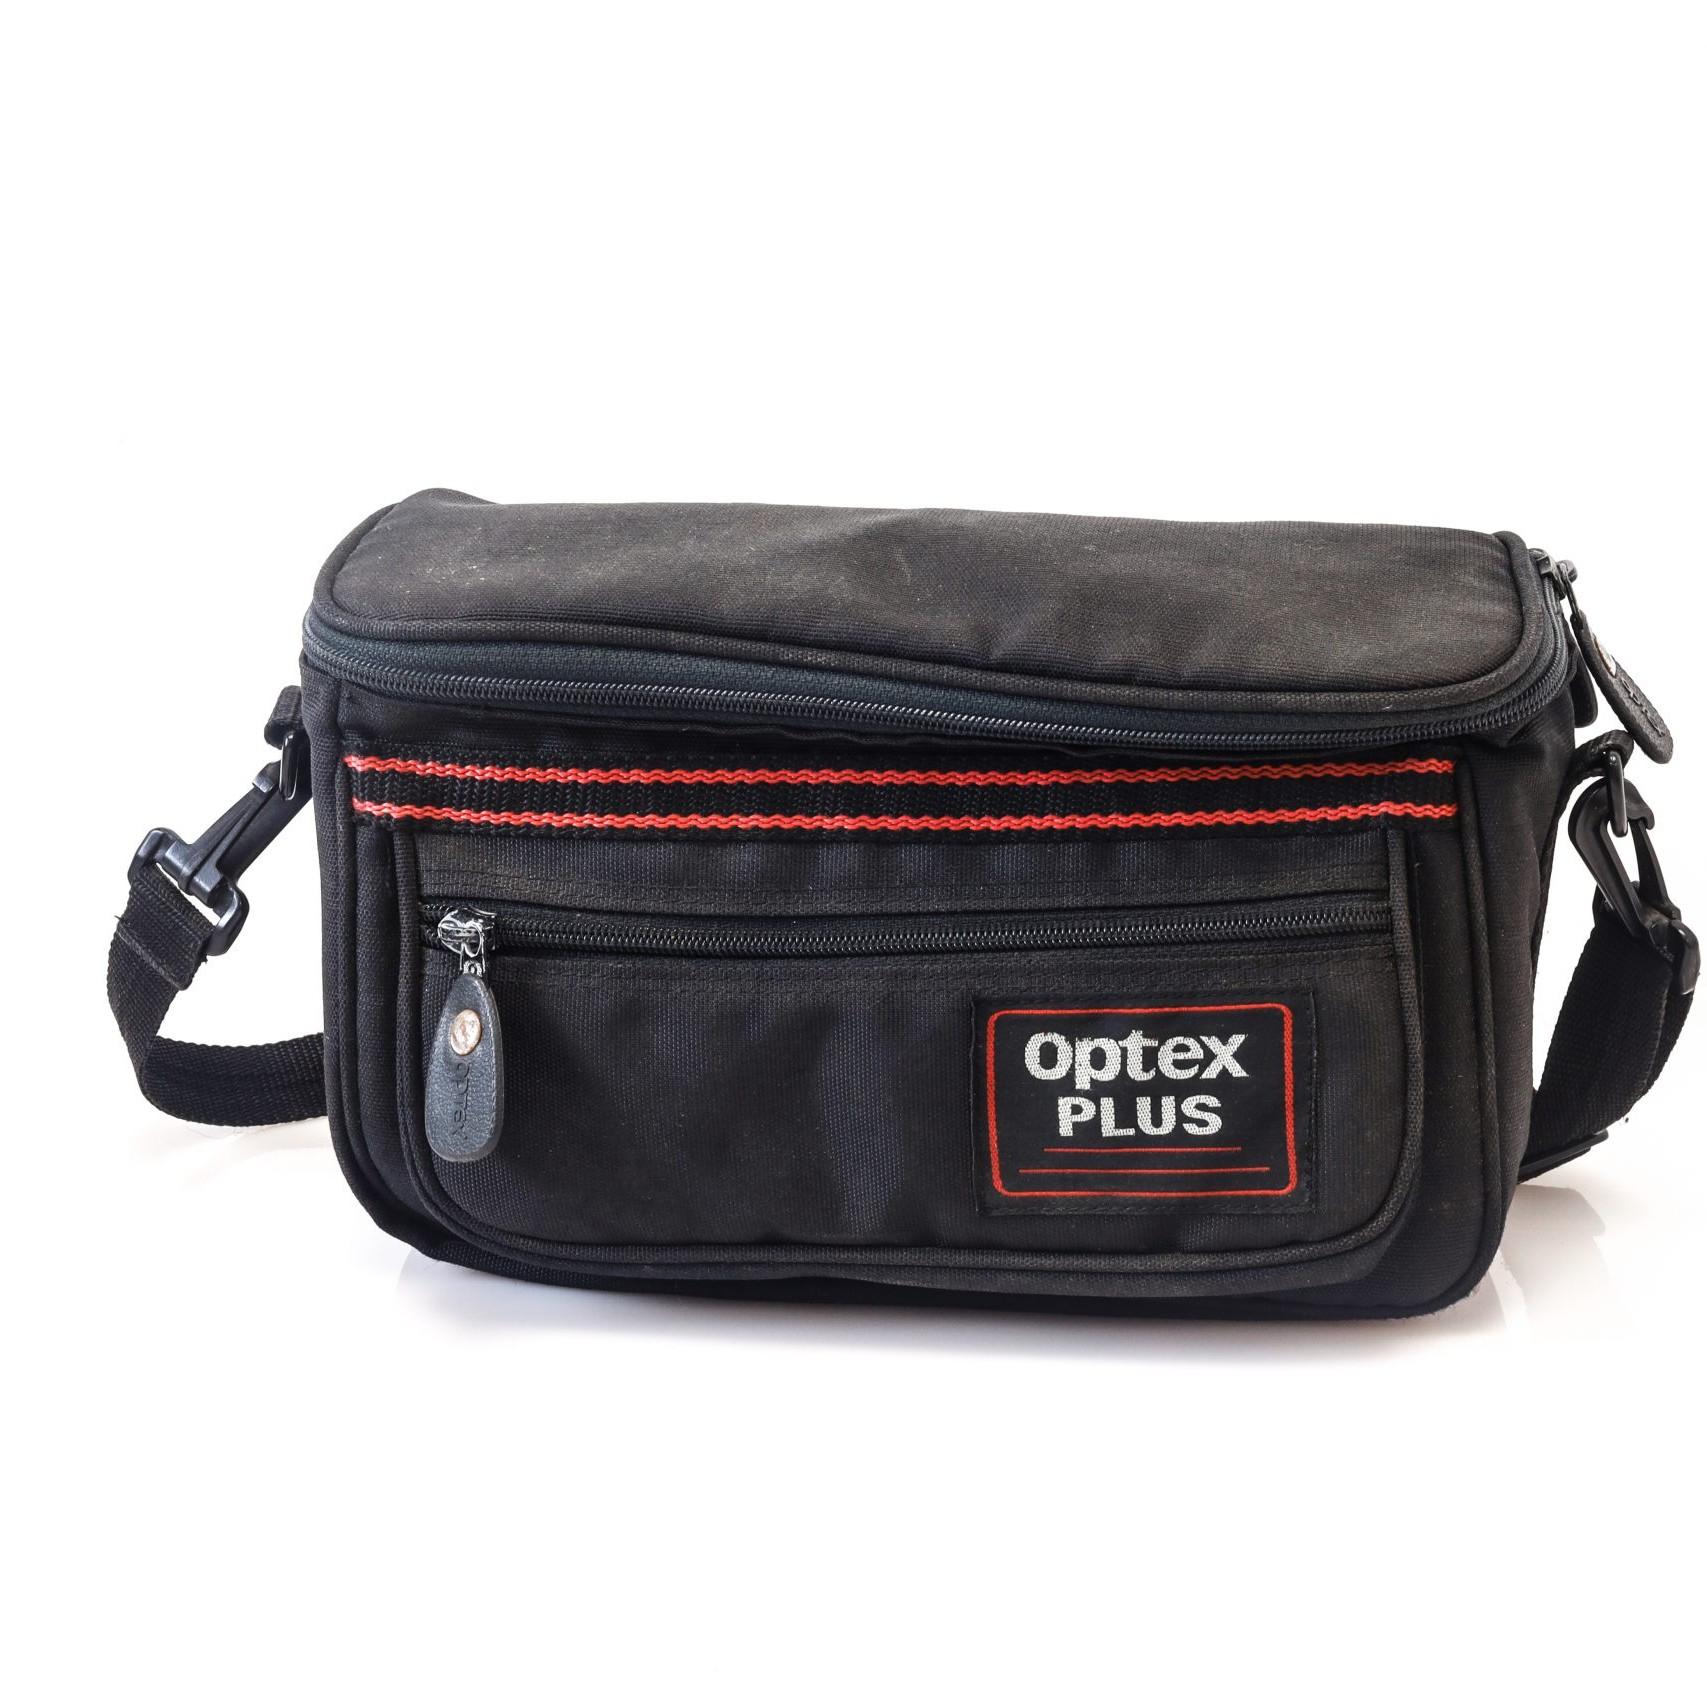 Fantastic Optex Plus Retro Camera Bag